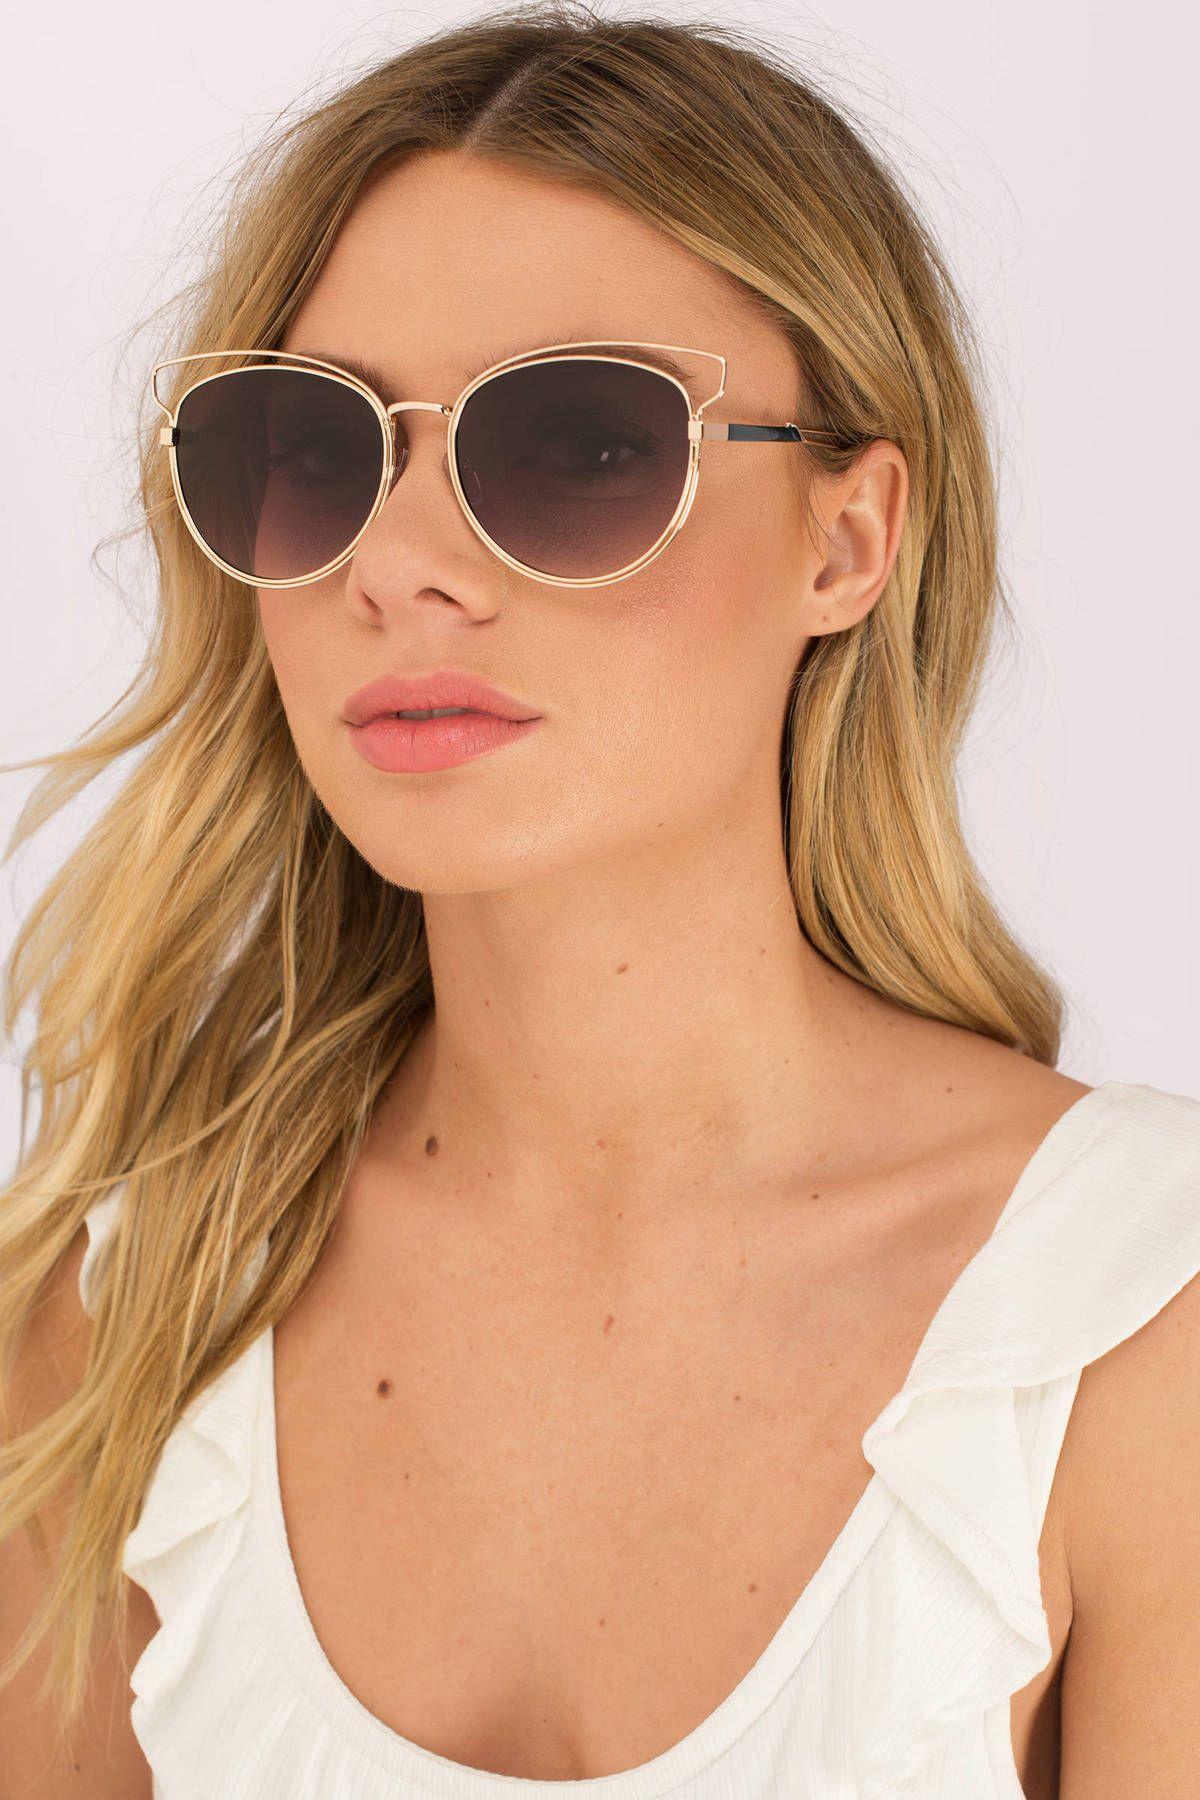 Chic Bohemian sunglasses for summer